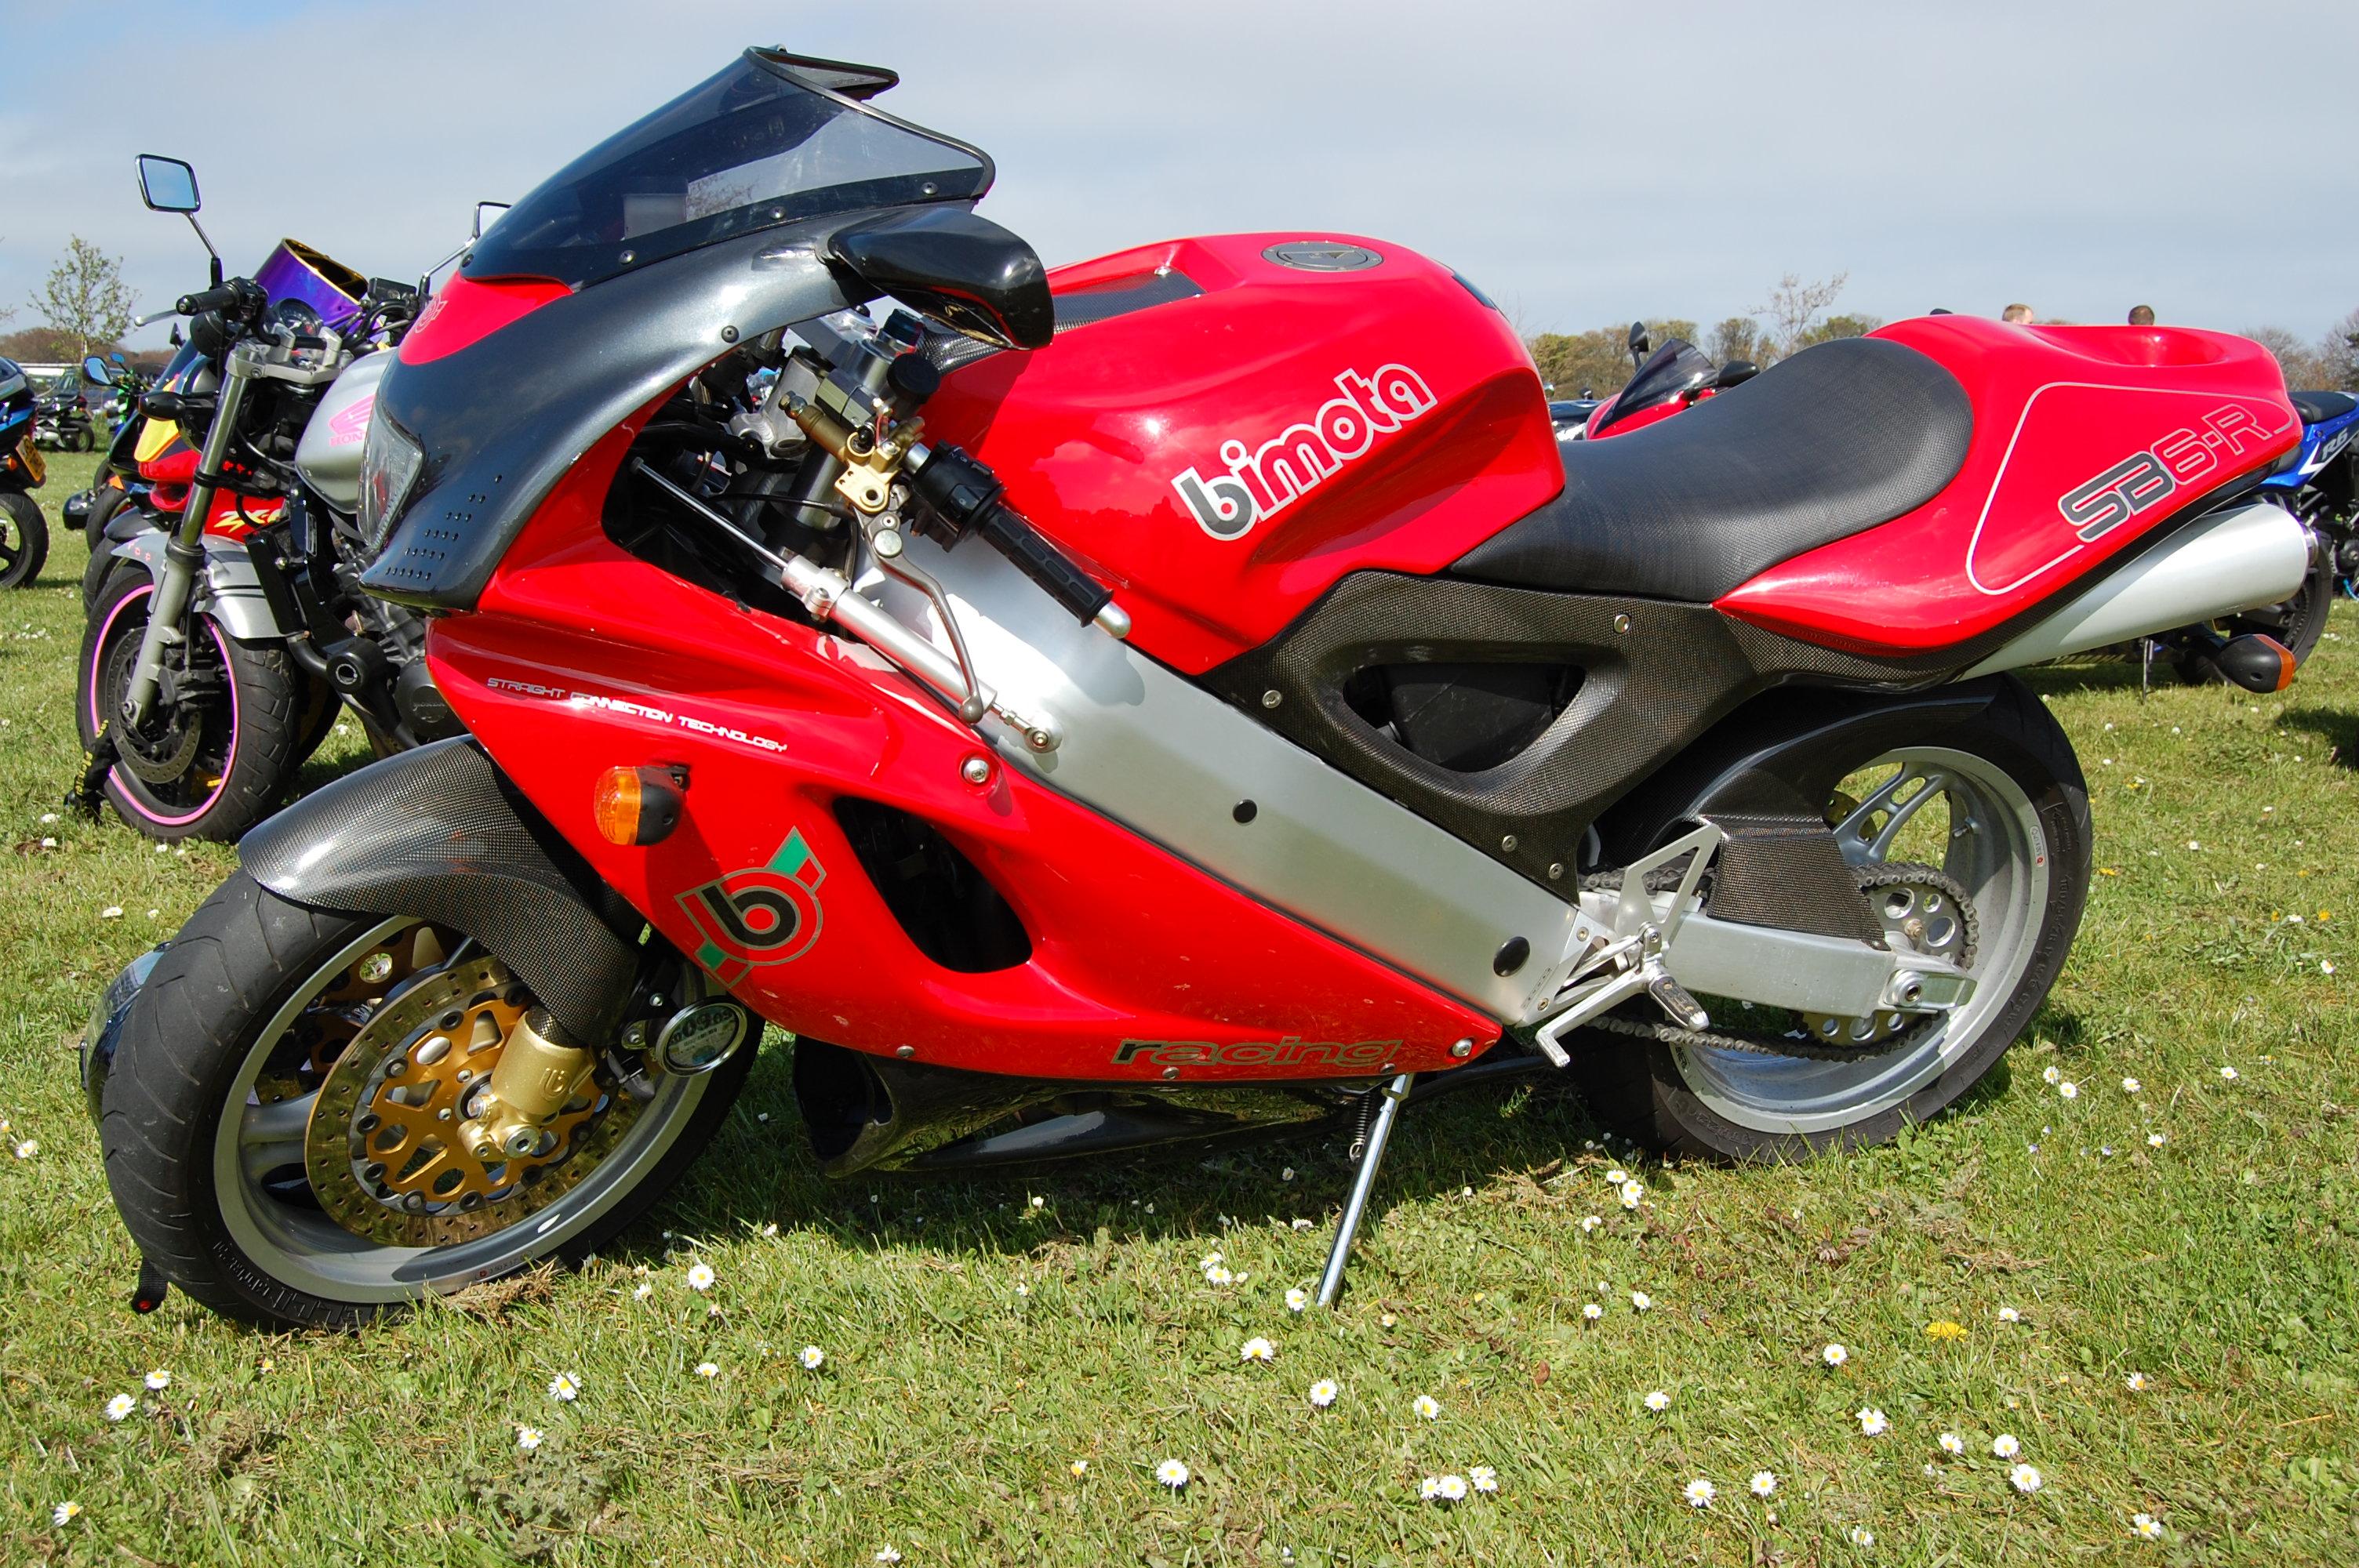 Ktm Wikipedia >> Hot Motorcycles Wallpapers: Bimota